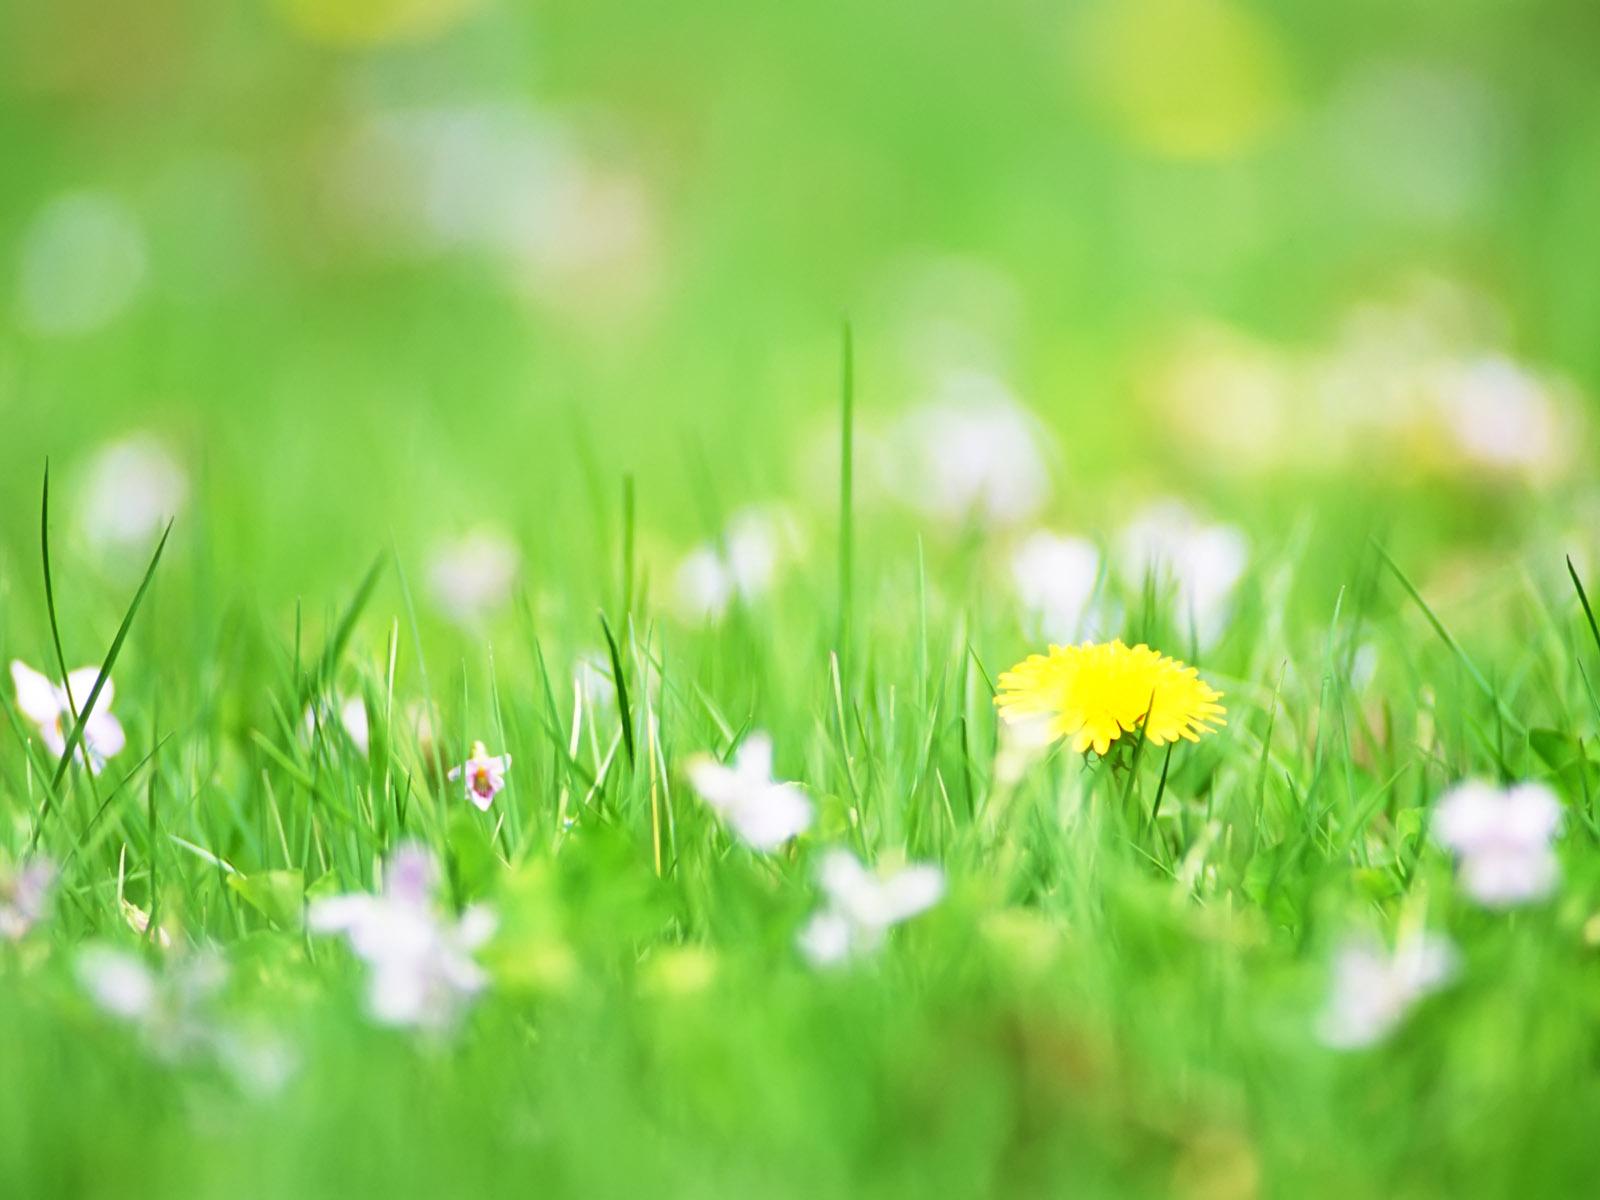 White Flowers Quotes 3 Free Hd Wallpaper Hdflowerwallpaper